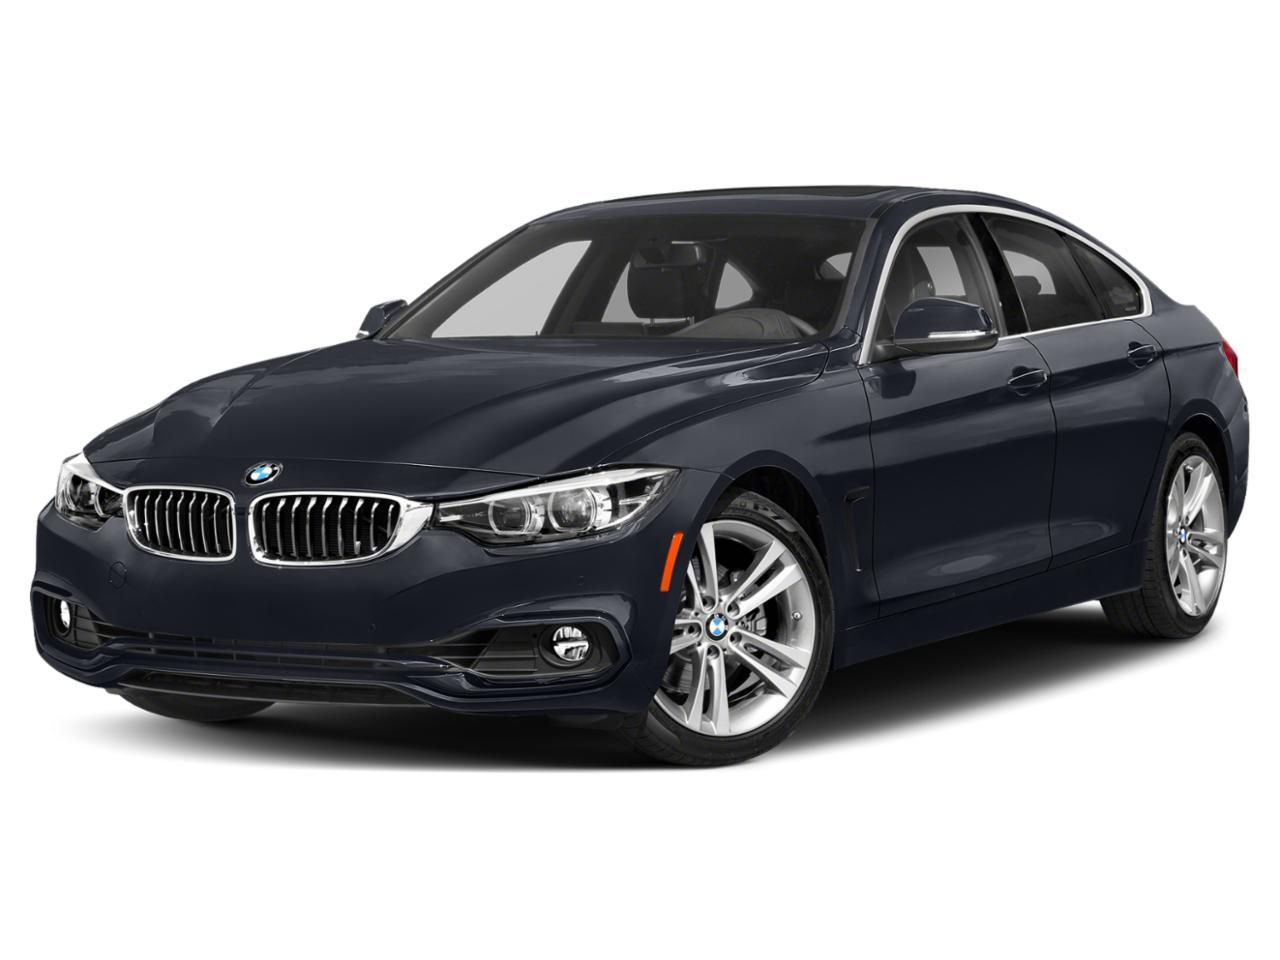 2018 BMW 430i Vehicle Photo in Corpus Christi, TX 78411